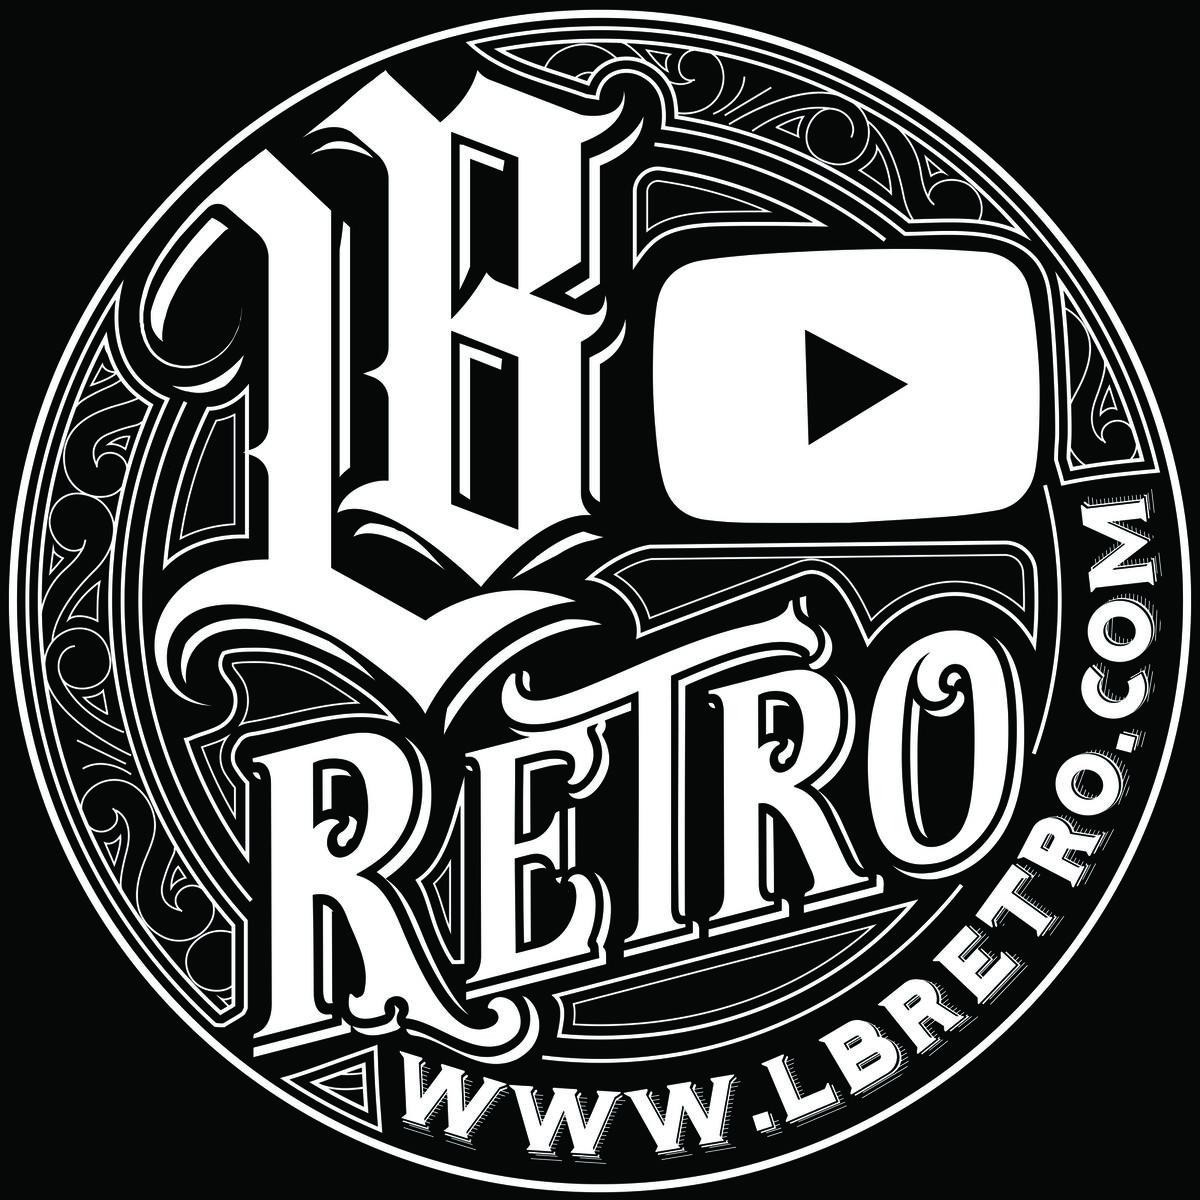 lbretro